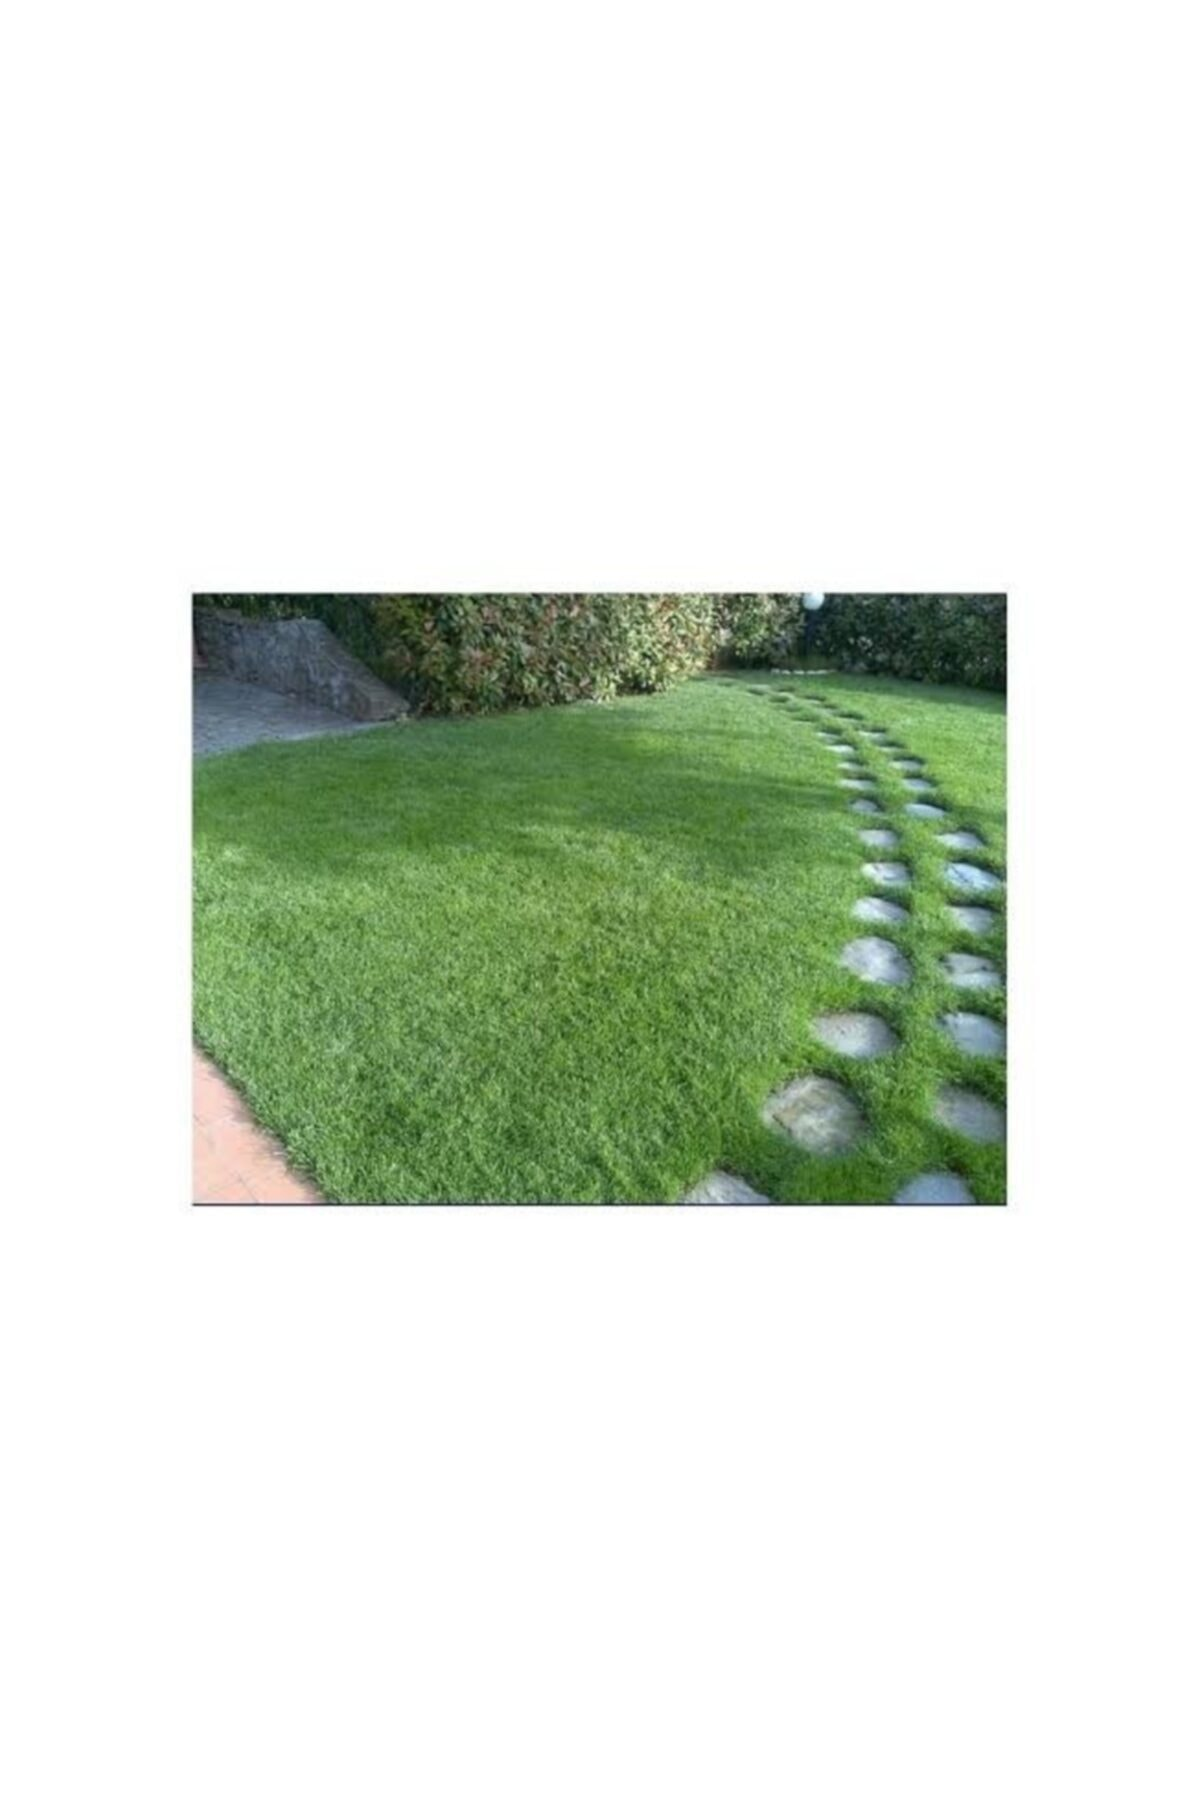 GRASS MIXTURE Çim Tohumu 10 Kg 6 Mix Altılı Karışım İthal Ot Çayır Tohum 2